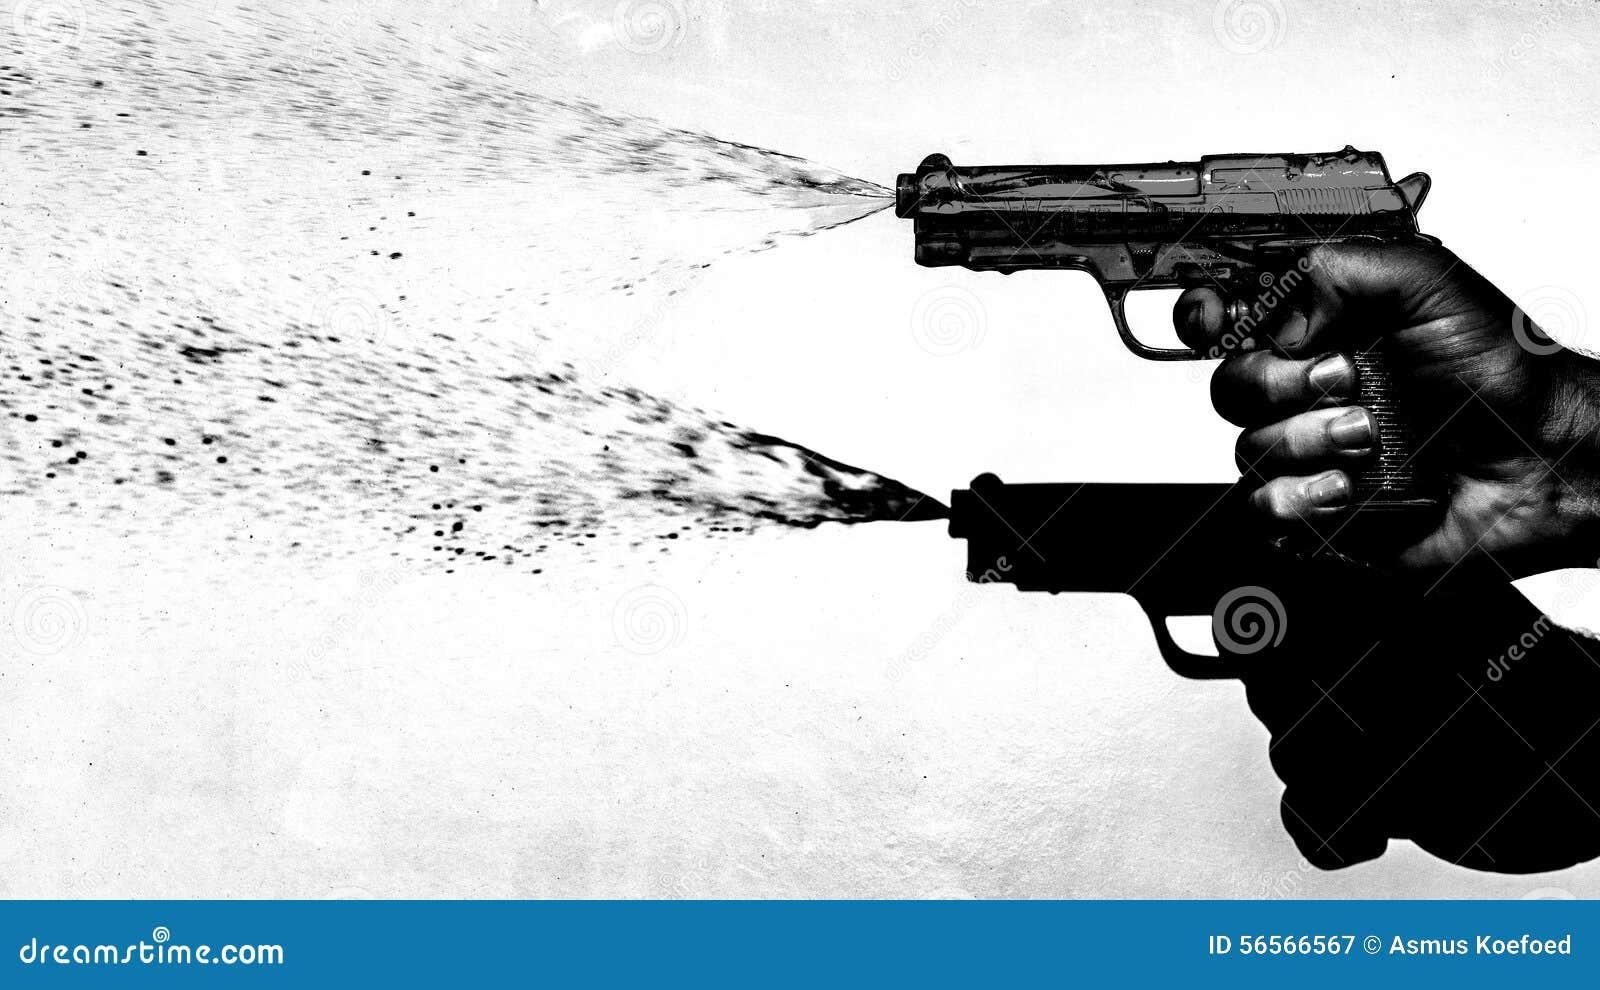 Download Ύφος της δεκαετίας του '70 πιστολιών νερού πυροβολισμού χεριών, γραπτό Στοκ Εικόνα - εικόνα από έκδοση, σιτάρι: 56566567